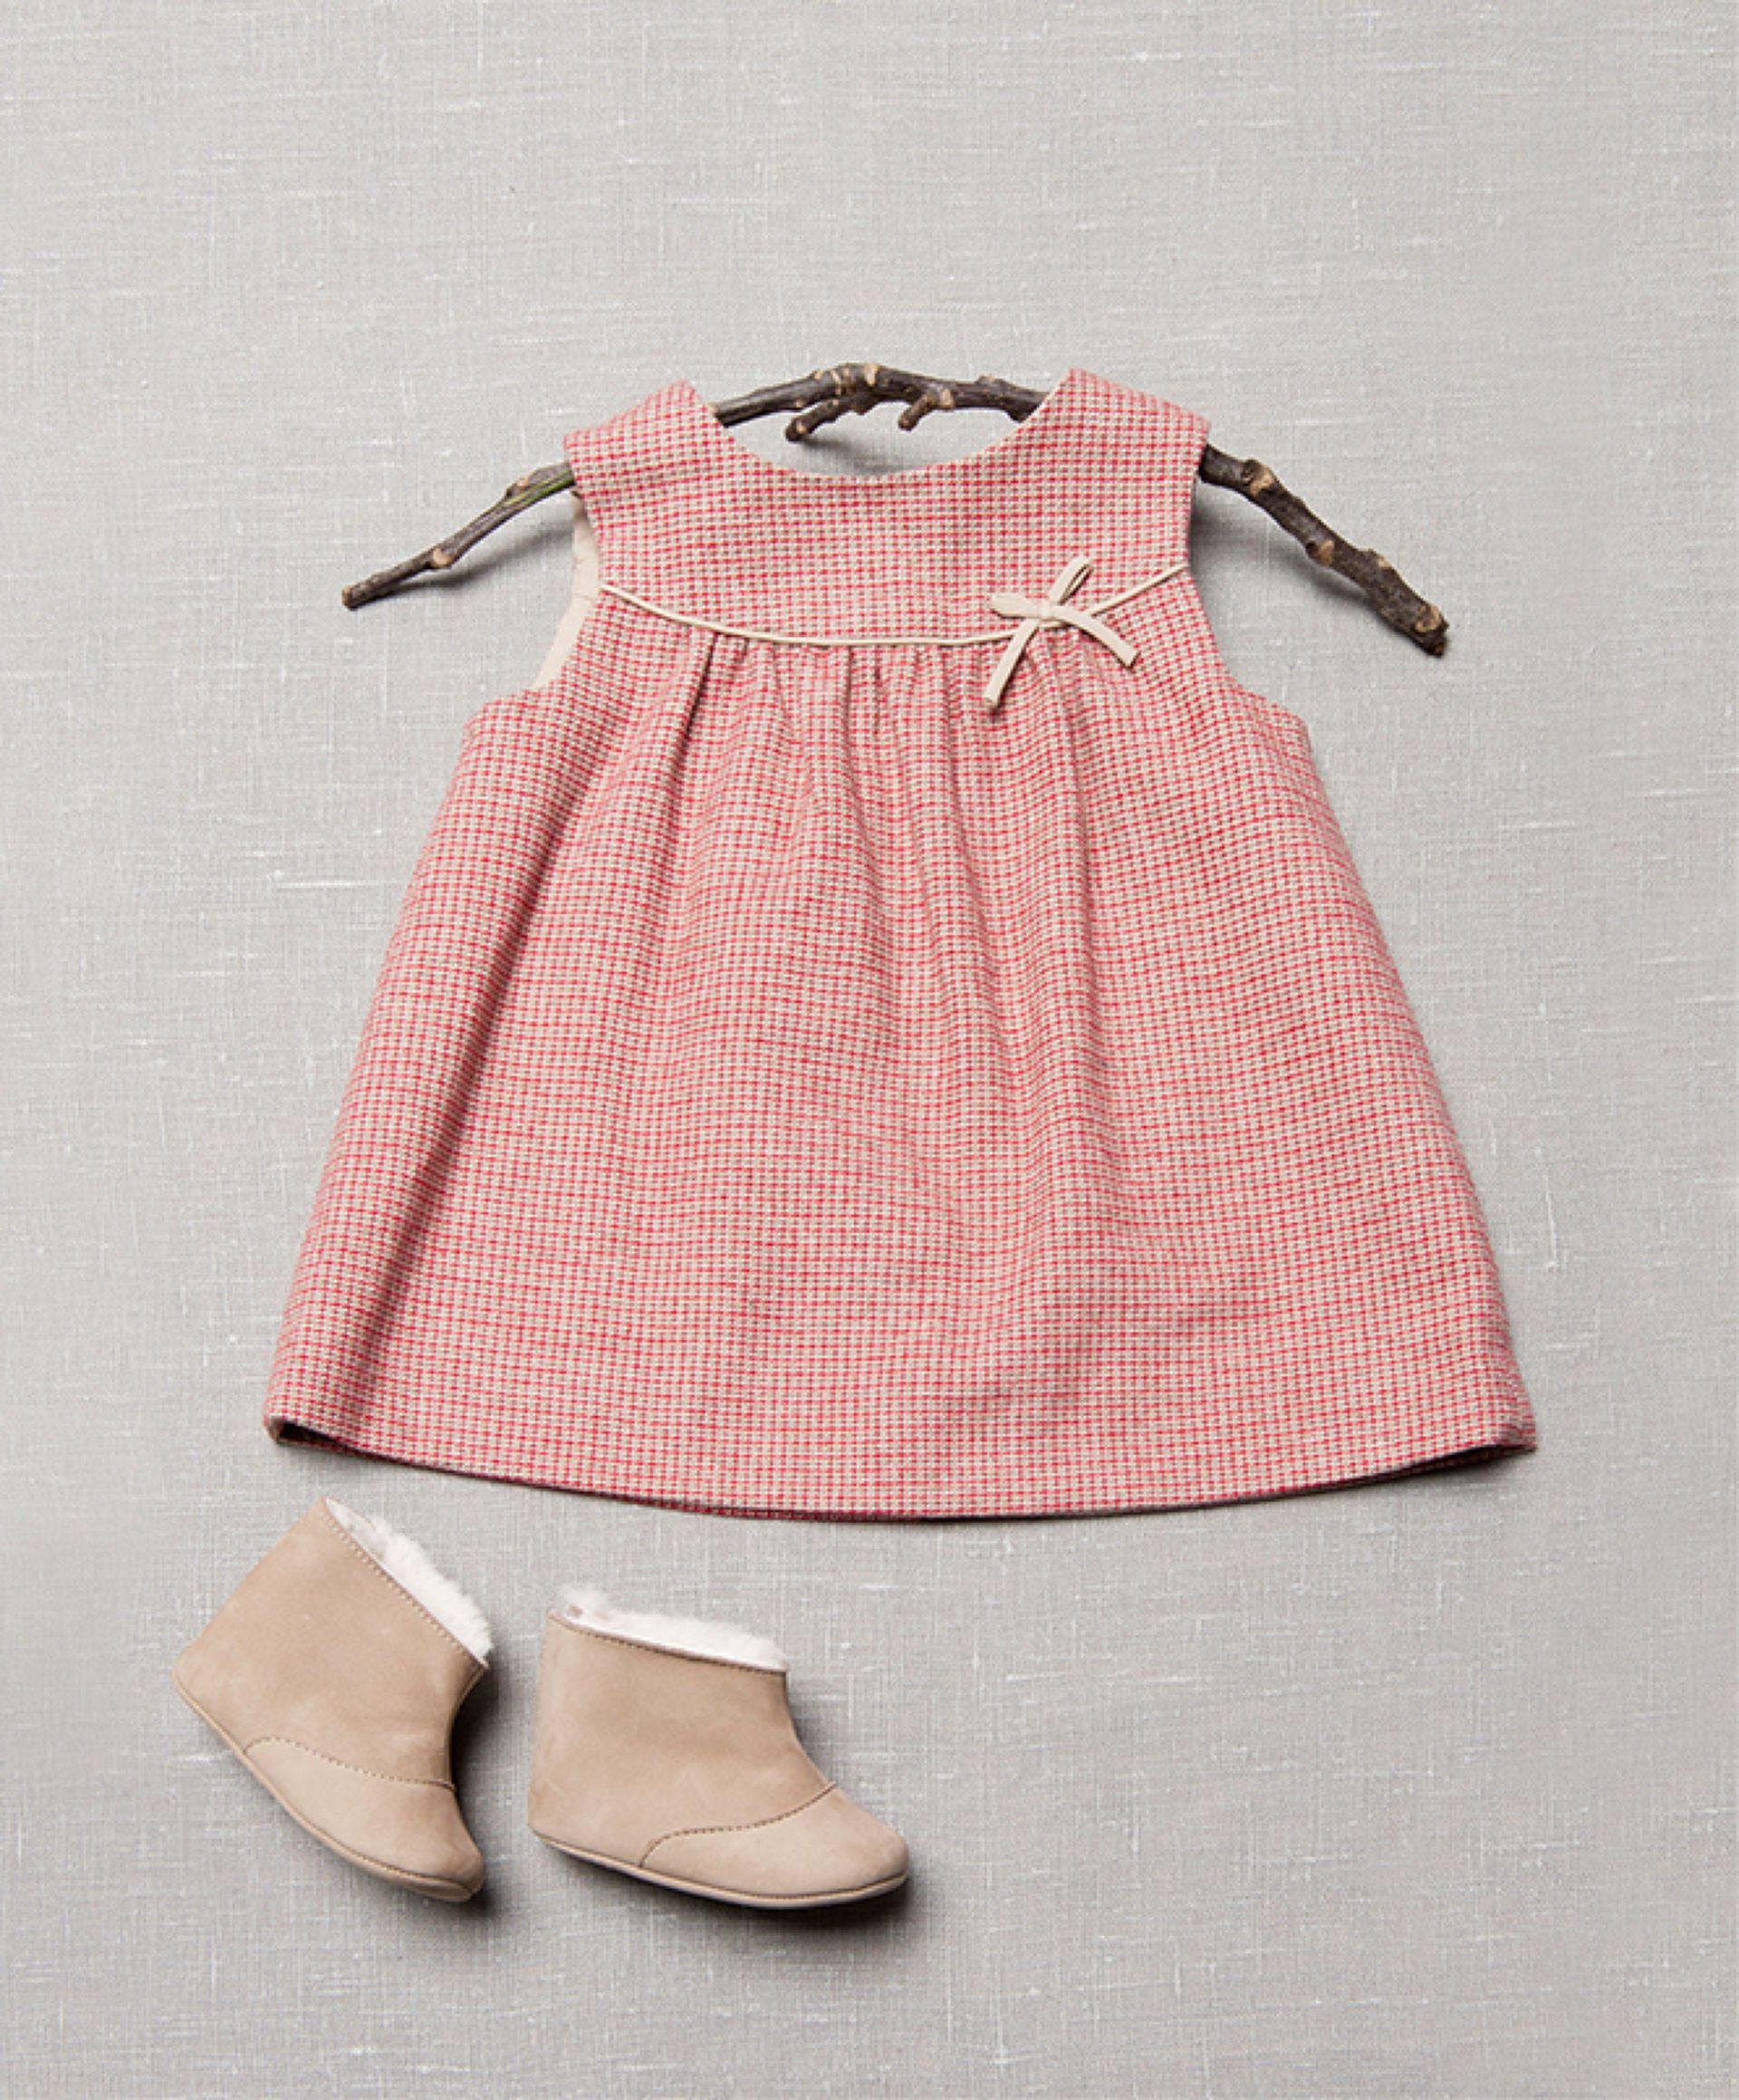 ZARA - #ZARALOOKBOOK - MINI - October | Thời trang, Con gái, Quần áo